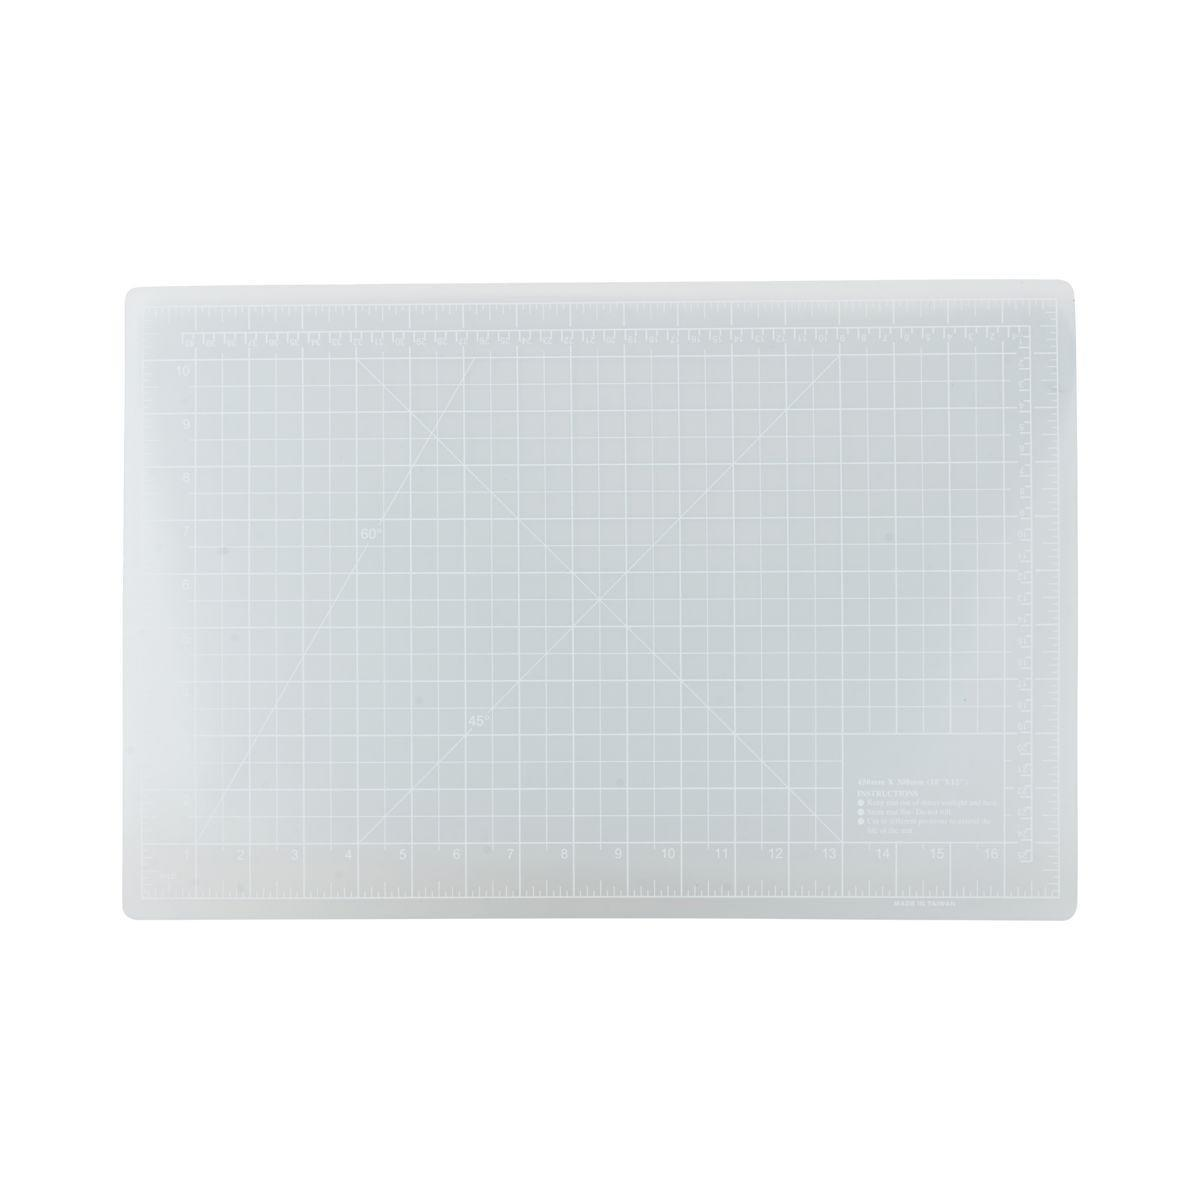 MONOGRAPH Řezací podložka Monograph 30x45 cm, modrá barva, šedá barva, plast